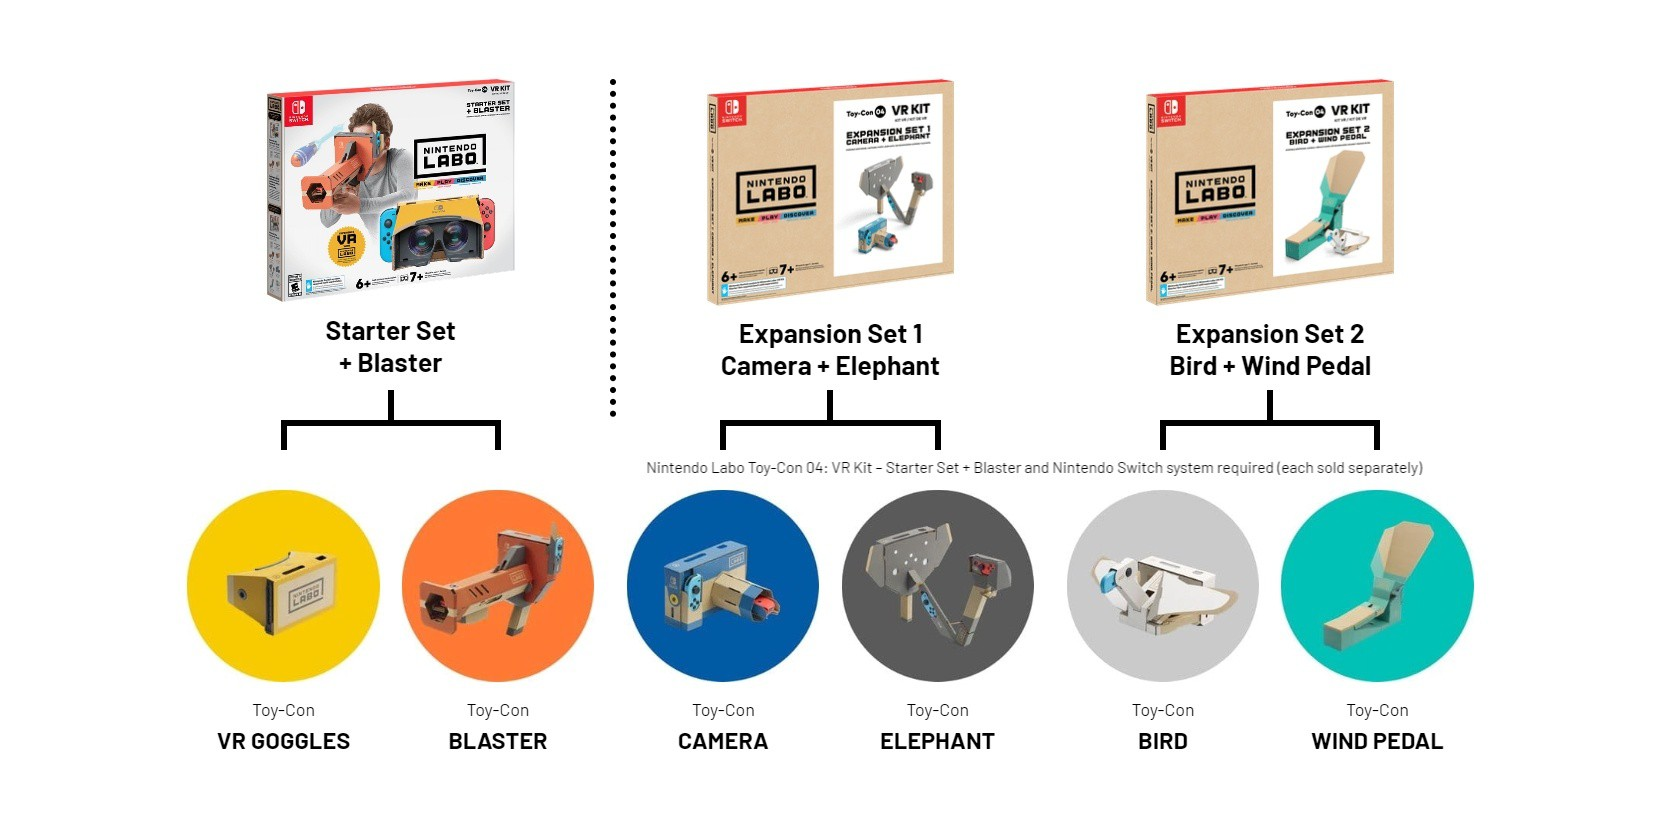 Nintendo LABO Toy-Con 04: VR Kit - Expansion Set 1 (Camera + Elephant)